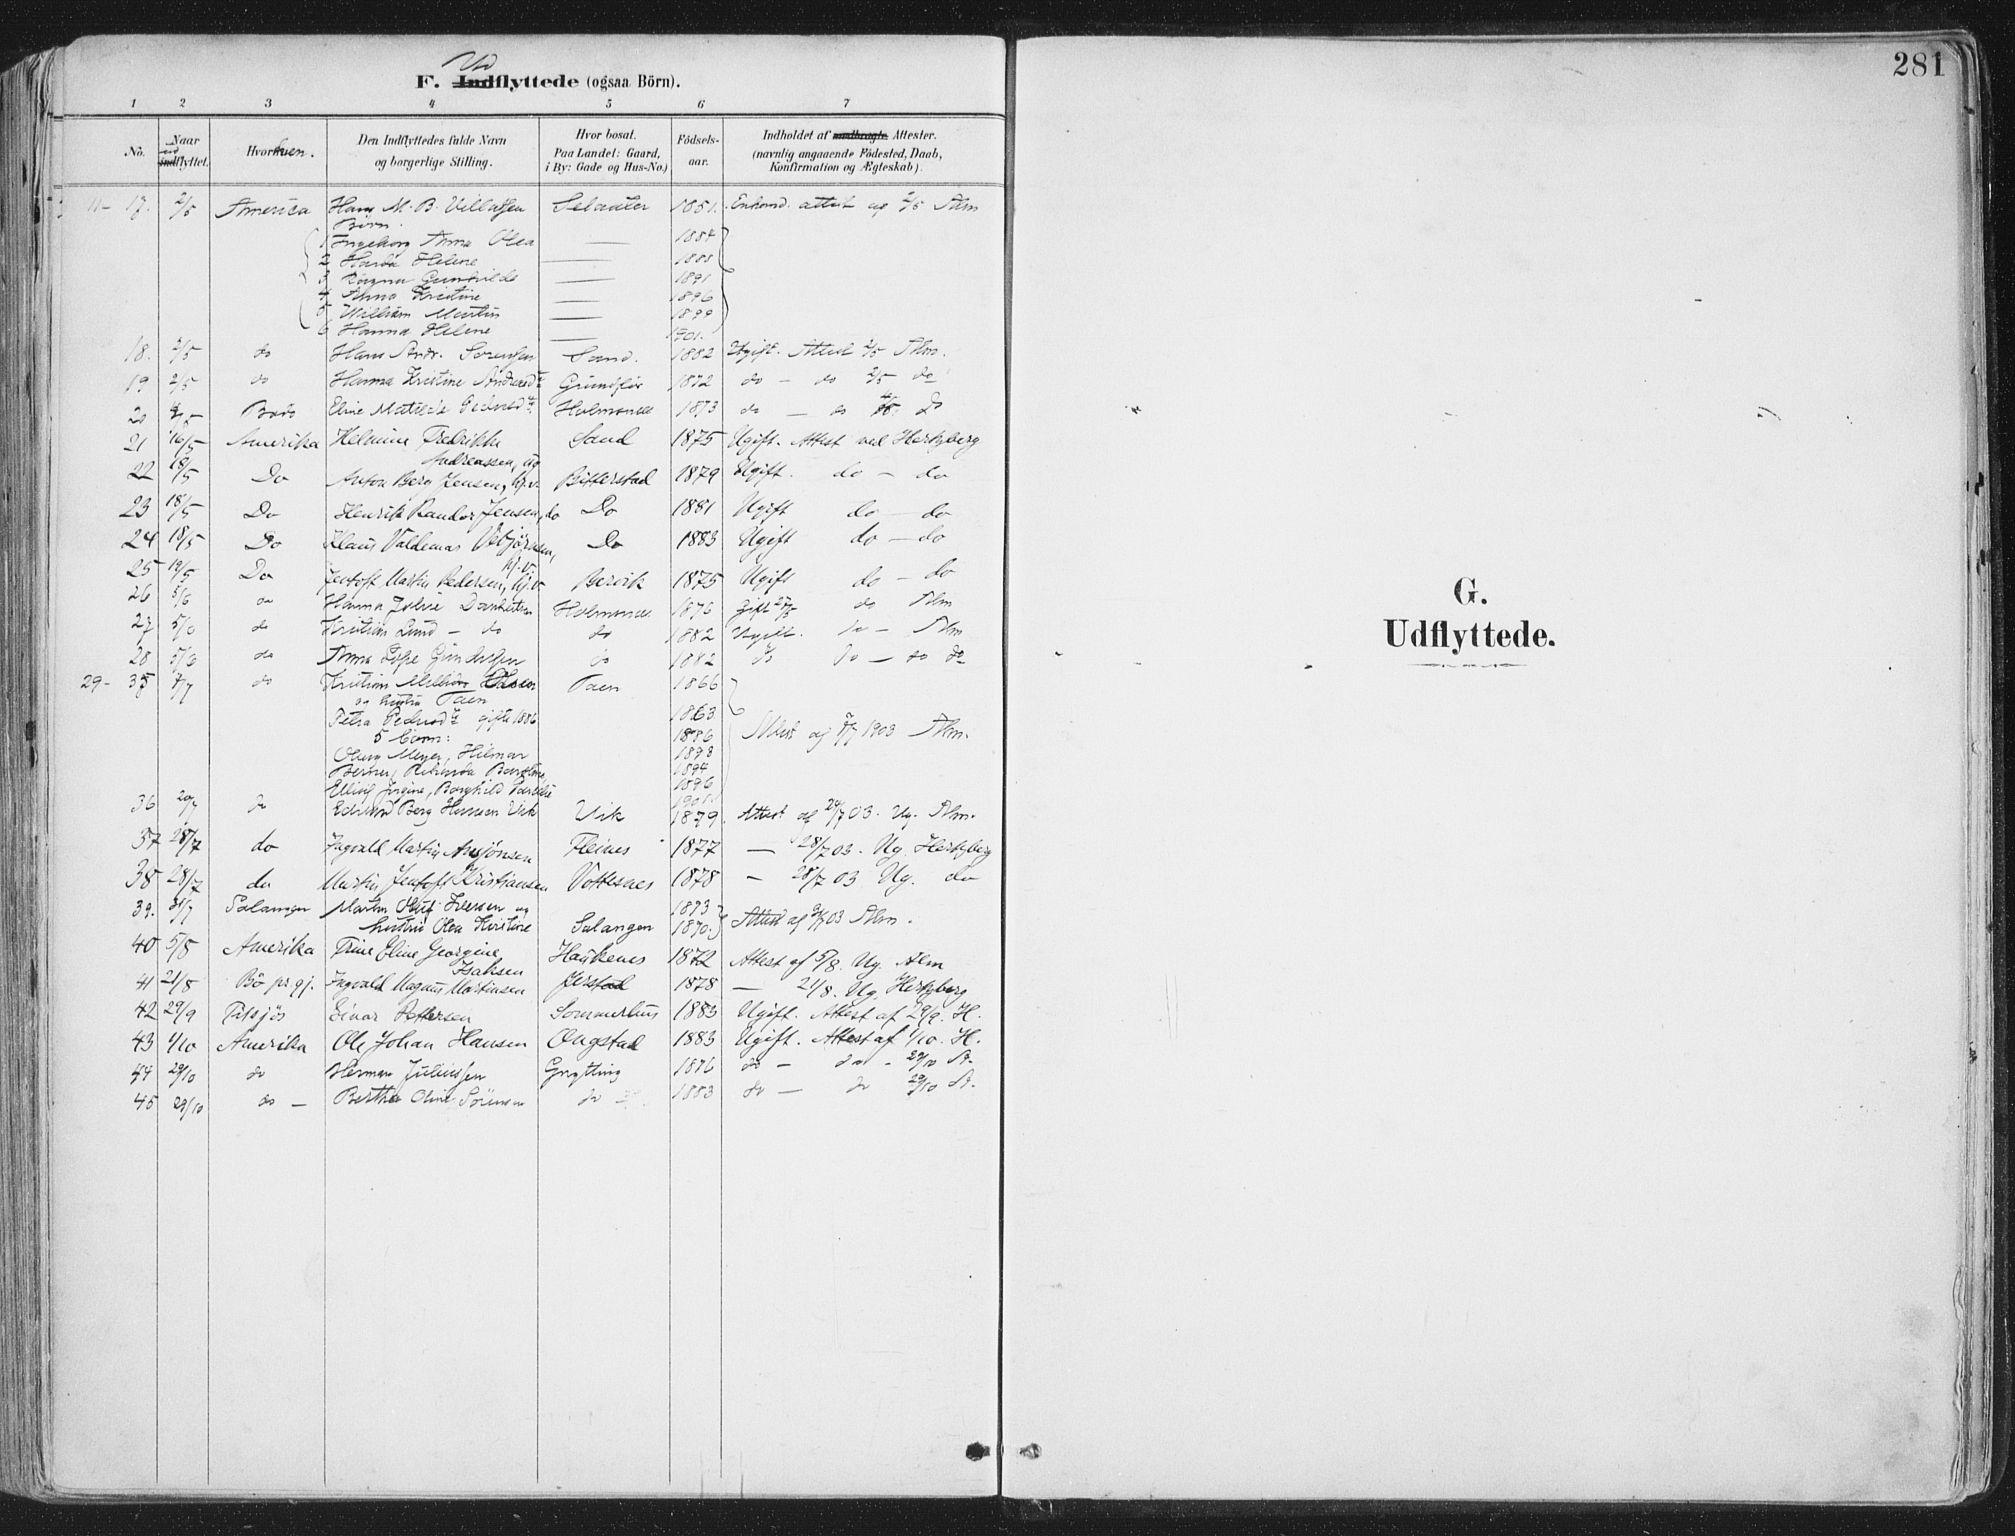 SAT, Ministerialprotokoller, klokkerbøker og fødselsregistre - Nordland, 888/L1246: Ministerialbok nr. 888A12, 1891-1903, s. 281